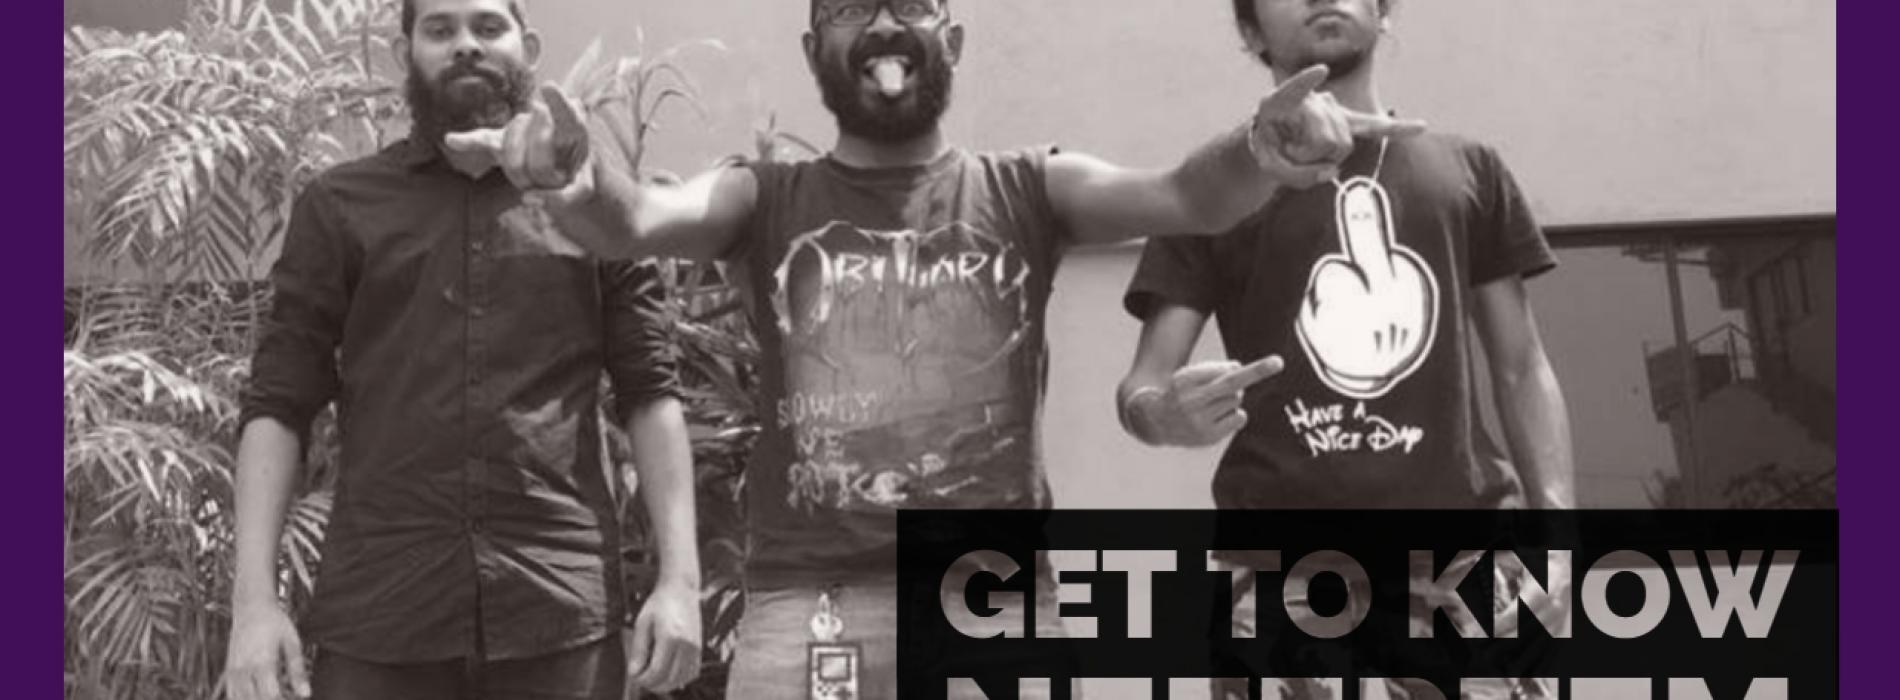 Nerfertem – A Metal Band From Sri Lanka